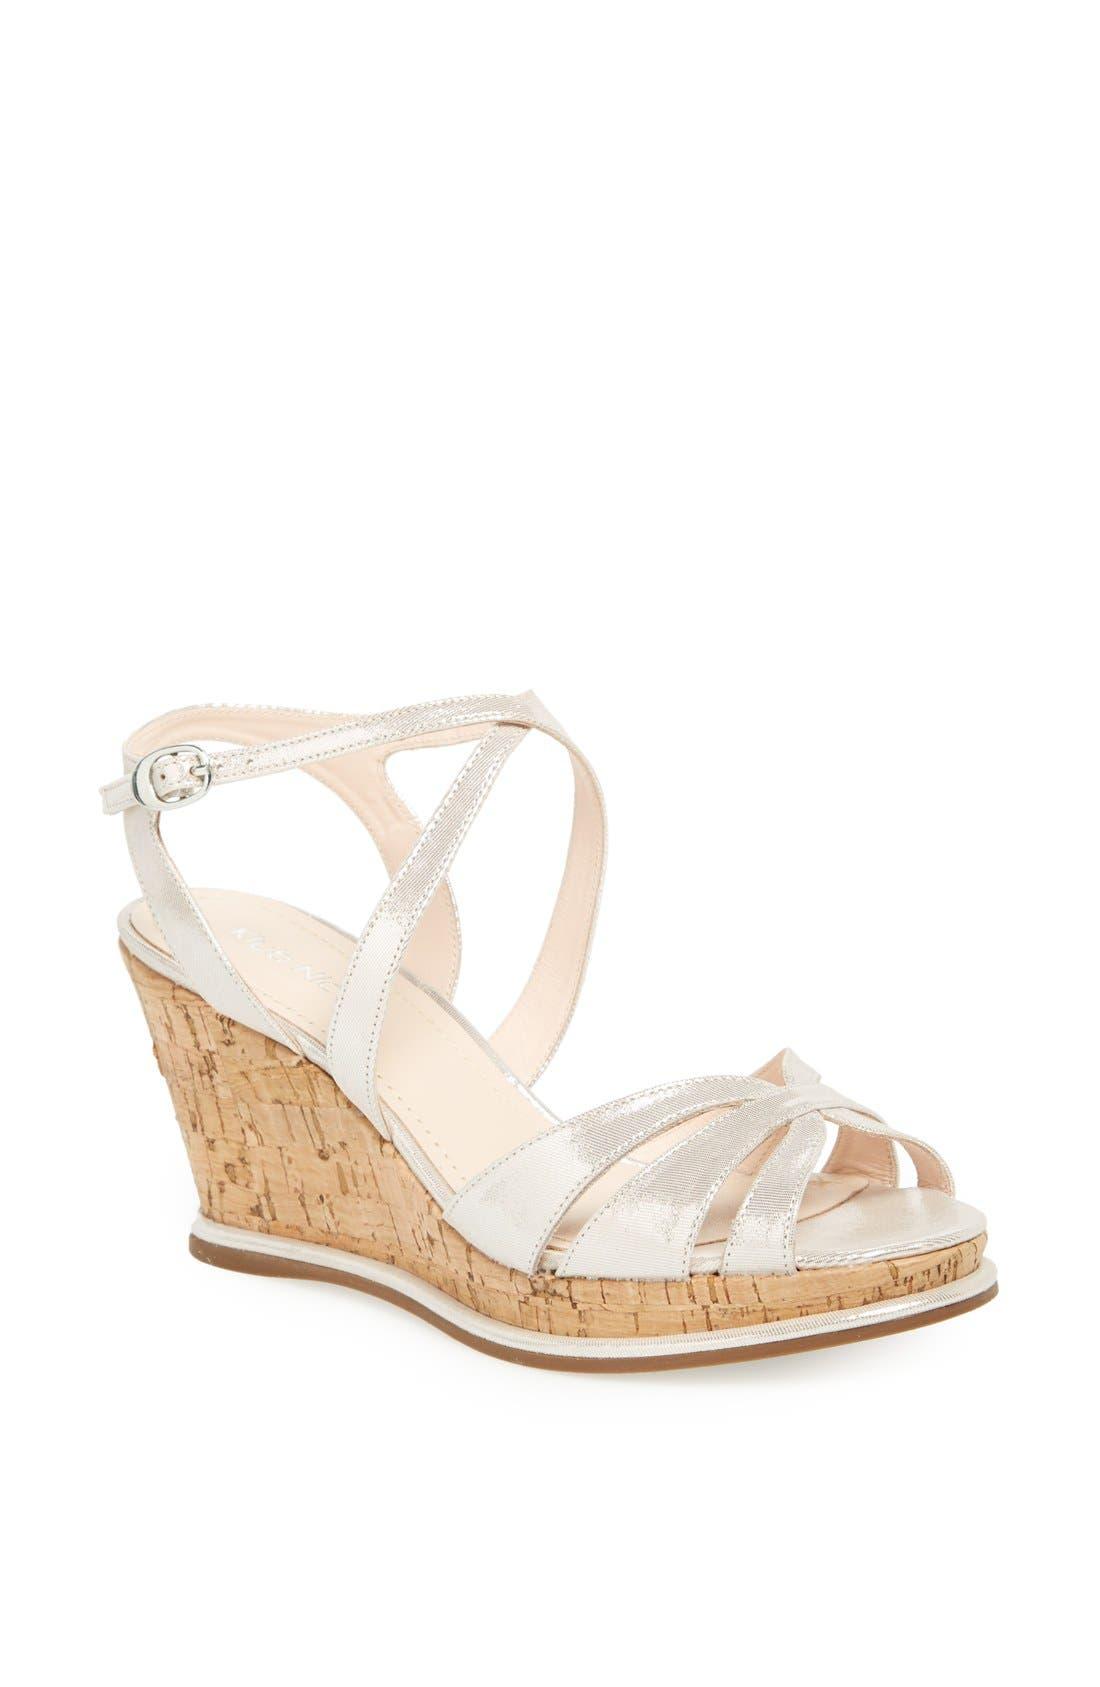 Main Image - Klub Nico 'Vava' Wedge Sandal